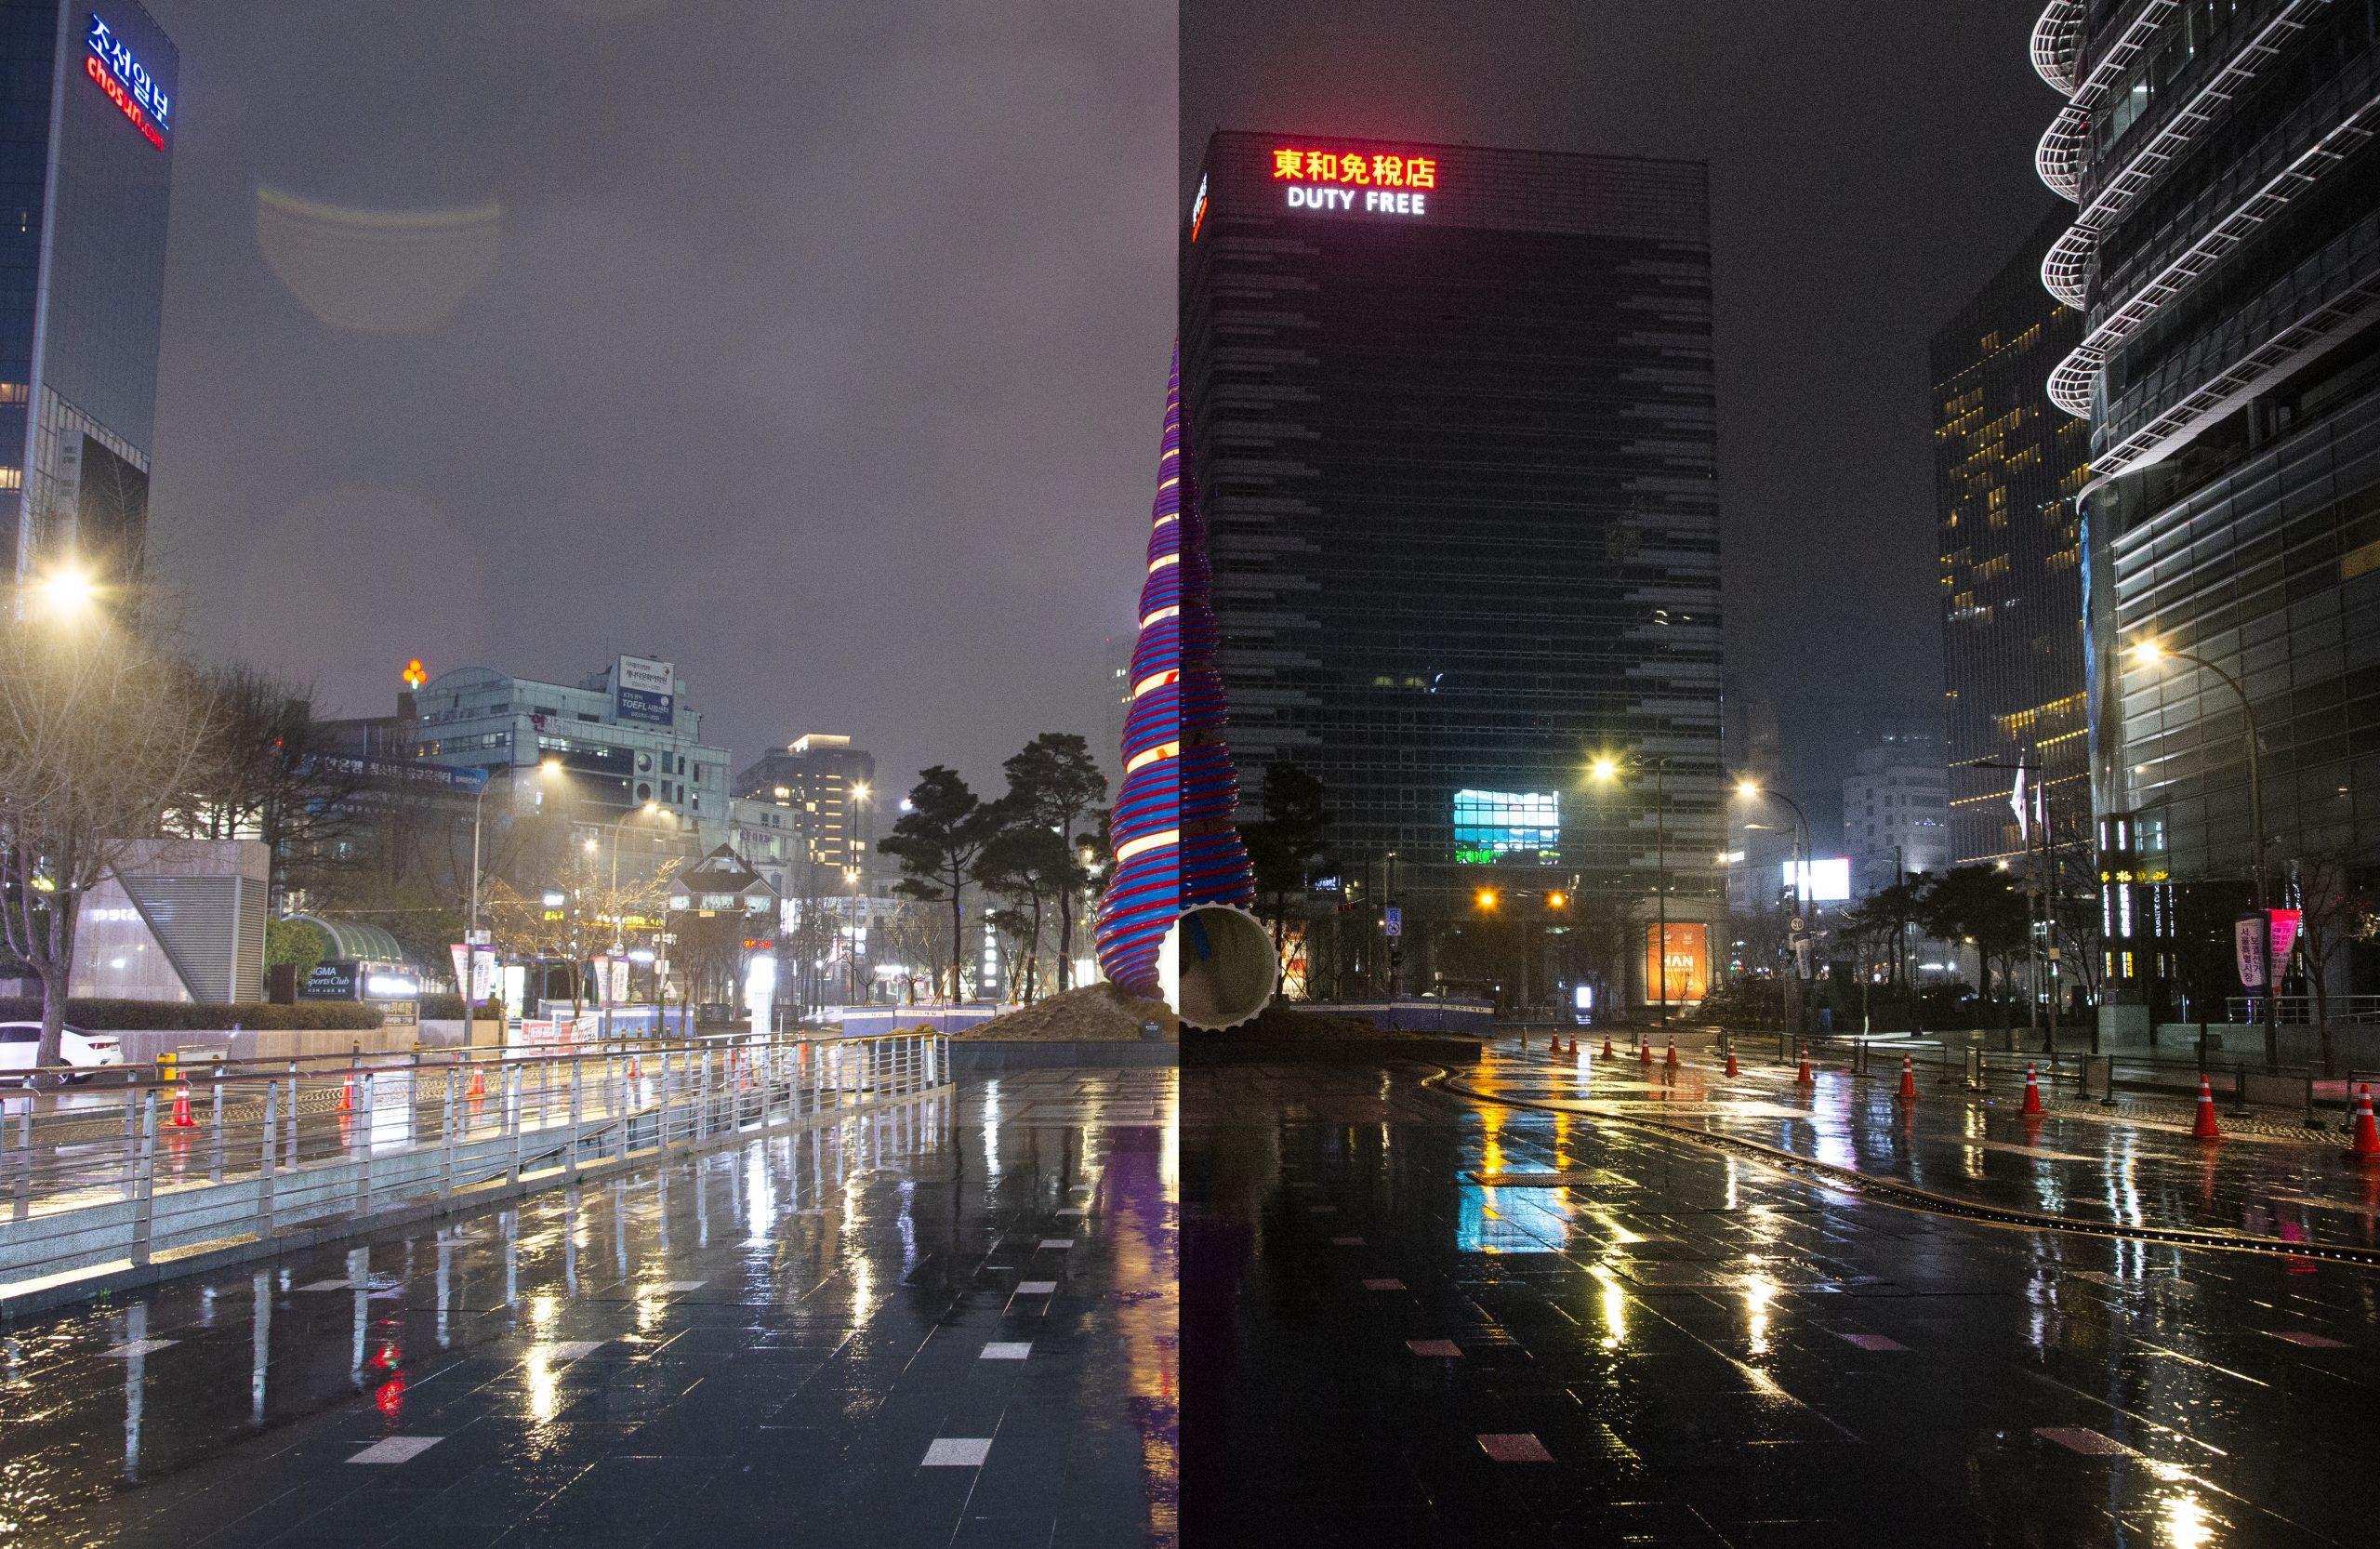 Seoul-Cheong-gye-Square-2021